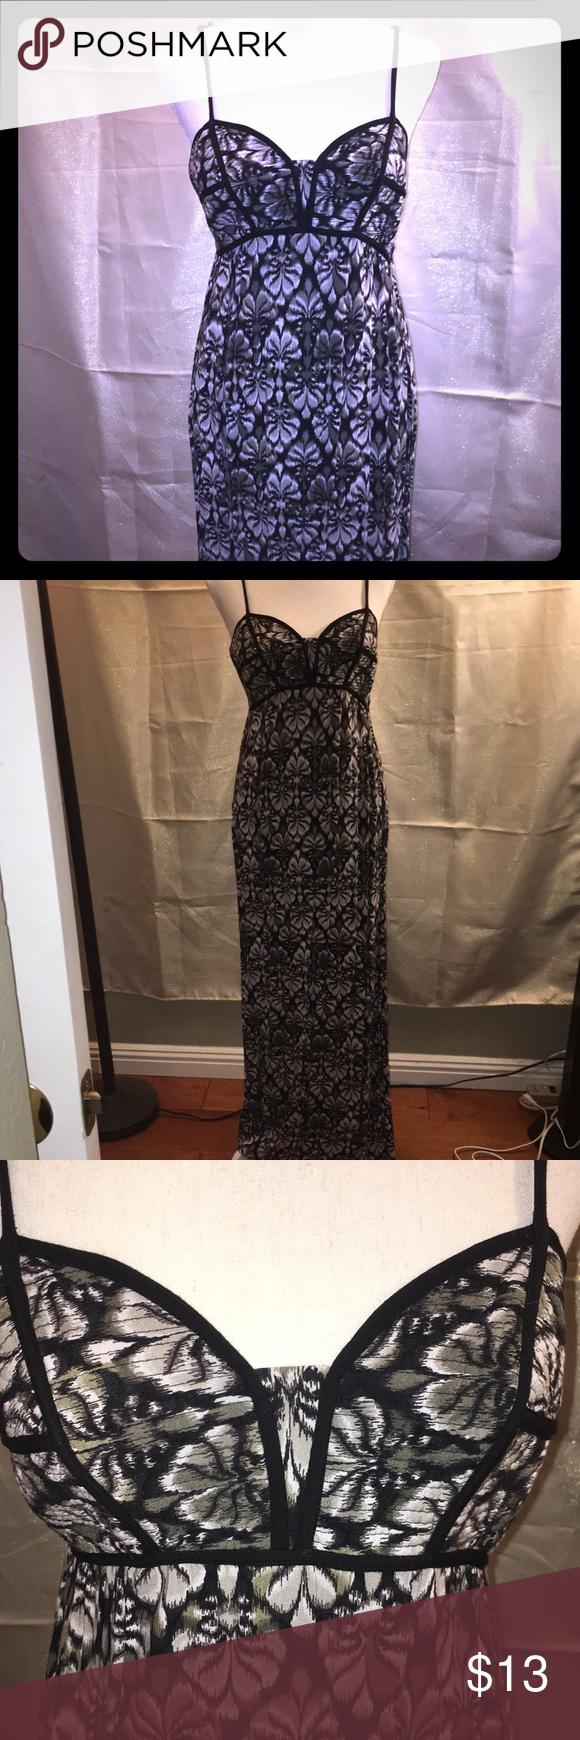 Xhilaration From Target Maxi Dress Size M Target Maxi Dresses Dresses Maxi Dress [ 1740 x 580 Pixel ]